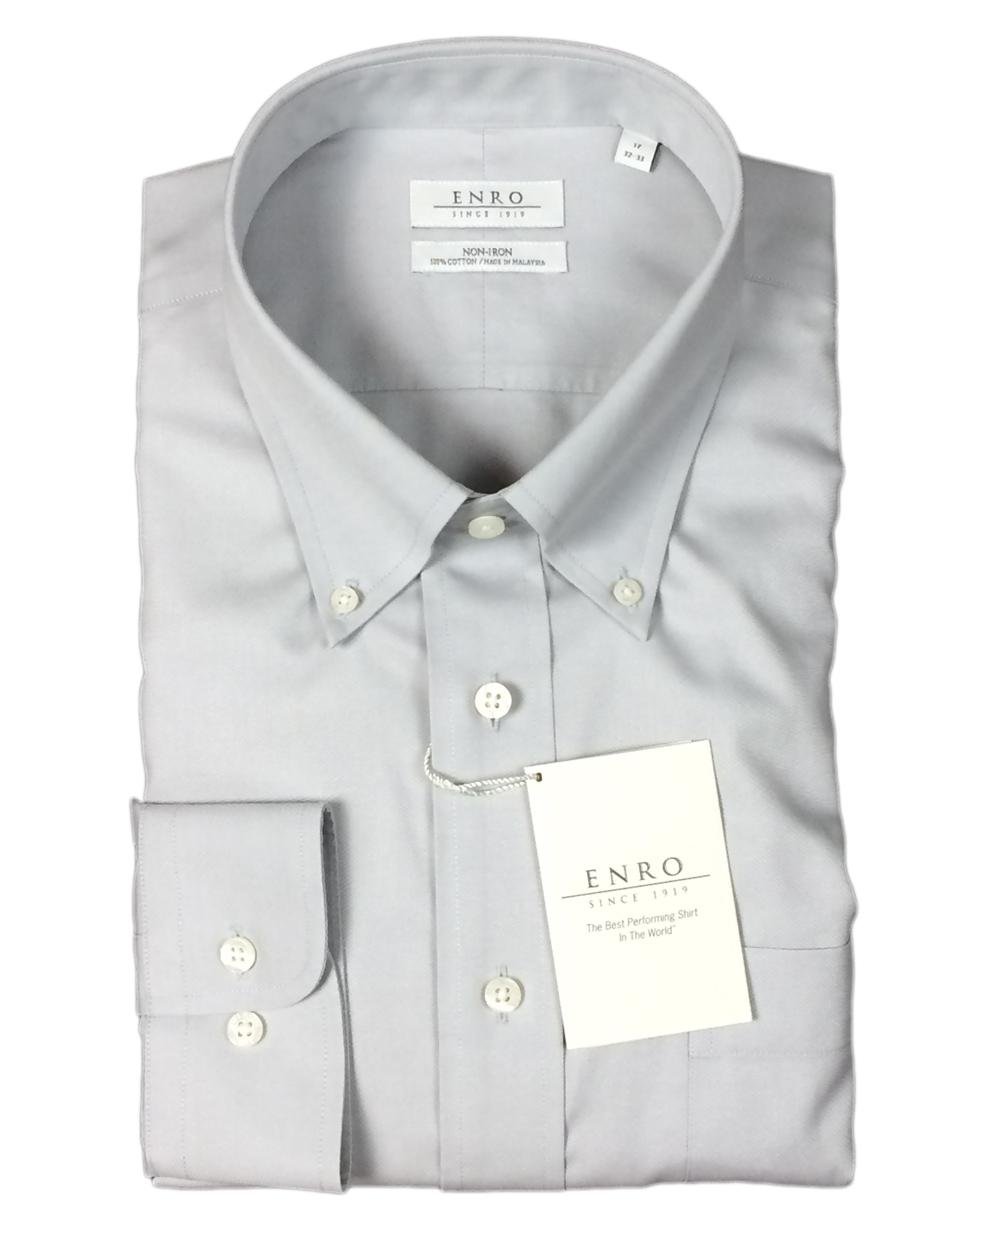 Enro men 39 s 100 cotton non iron button down dress shirt ebay for Mens 100 cotton button down shirts